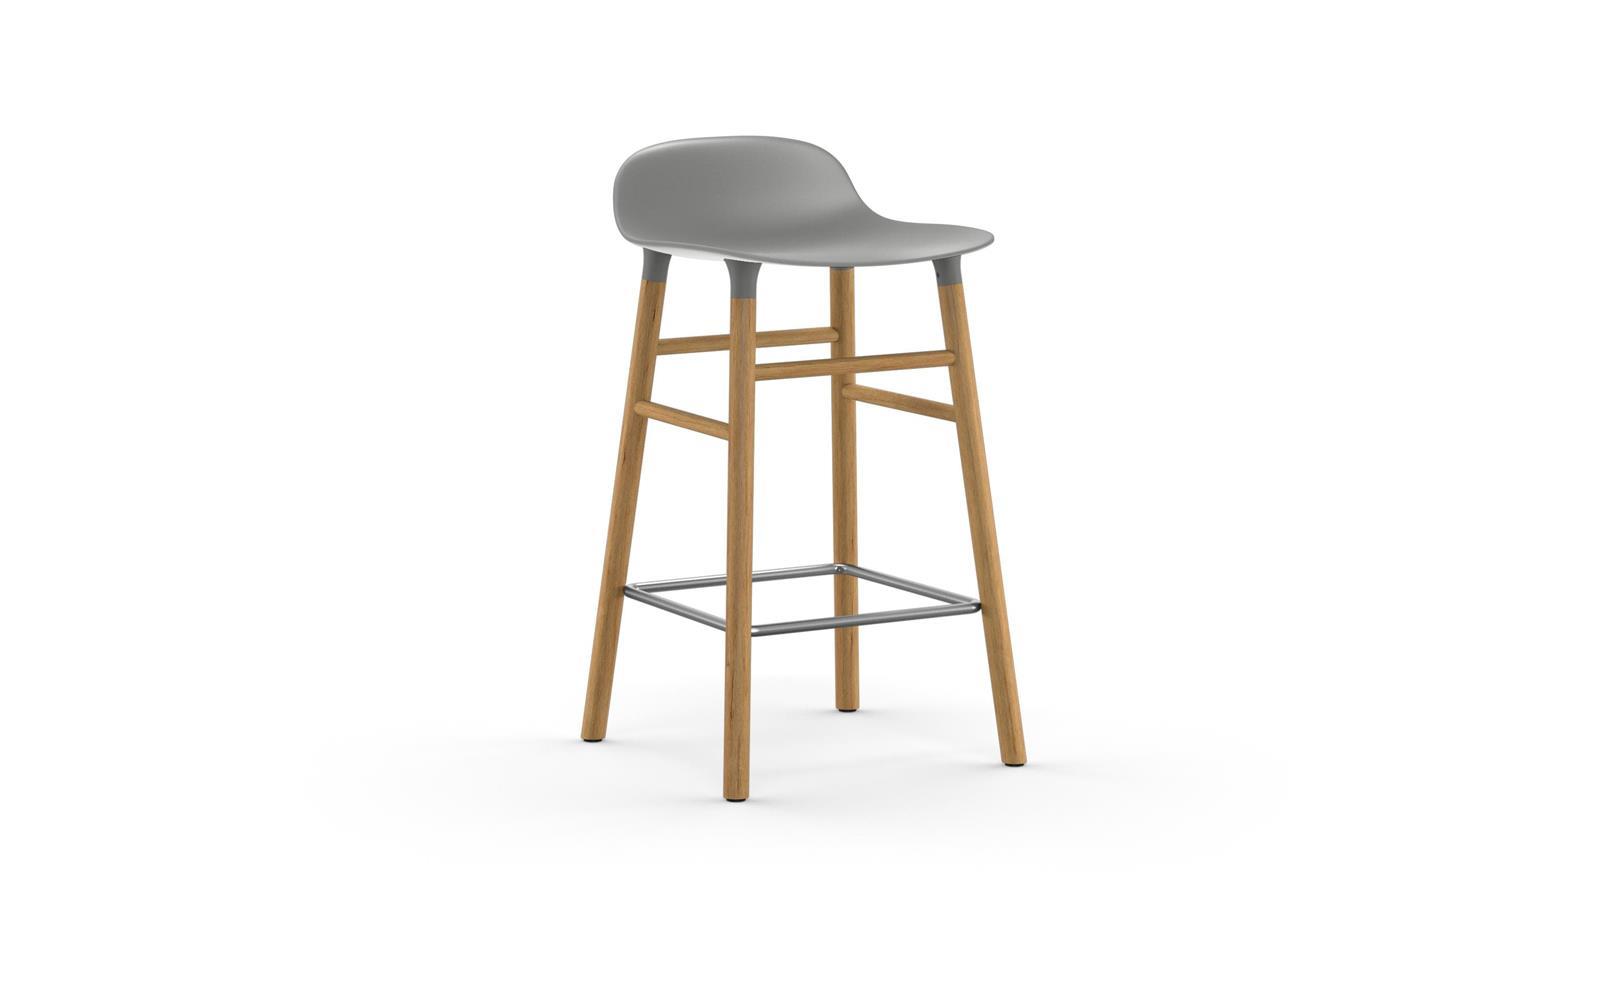 bar stool chair grey commercial restaurant chairs form molded plastic shell with oak legs barstool 65 cm oak1